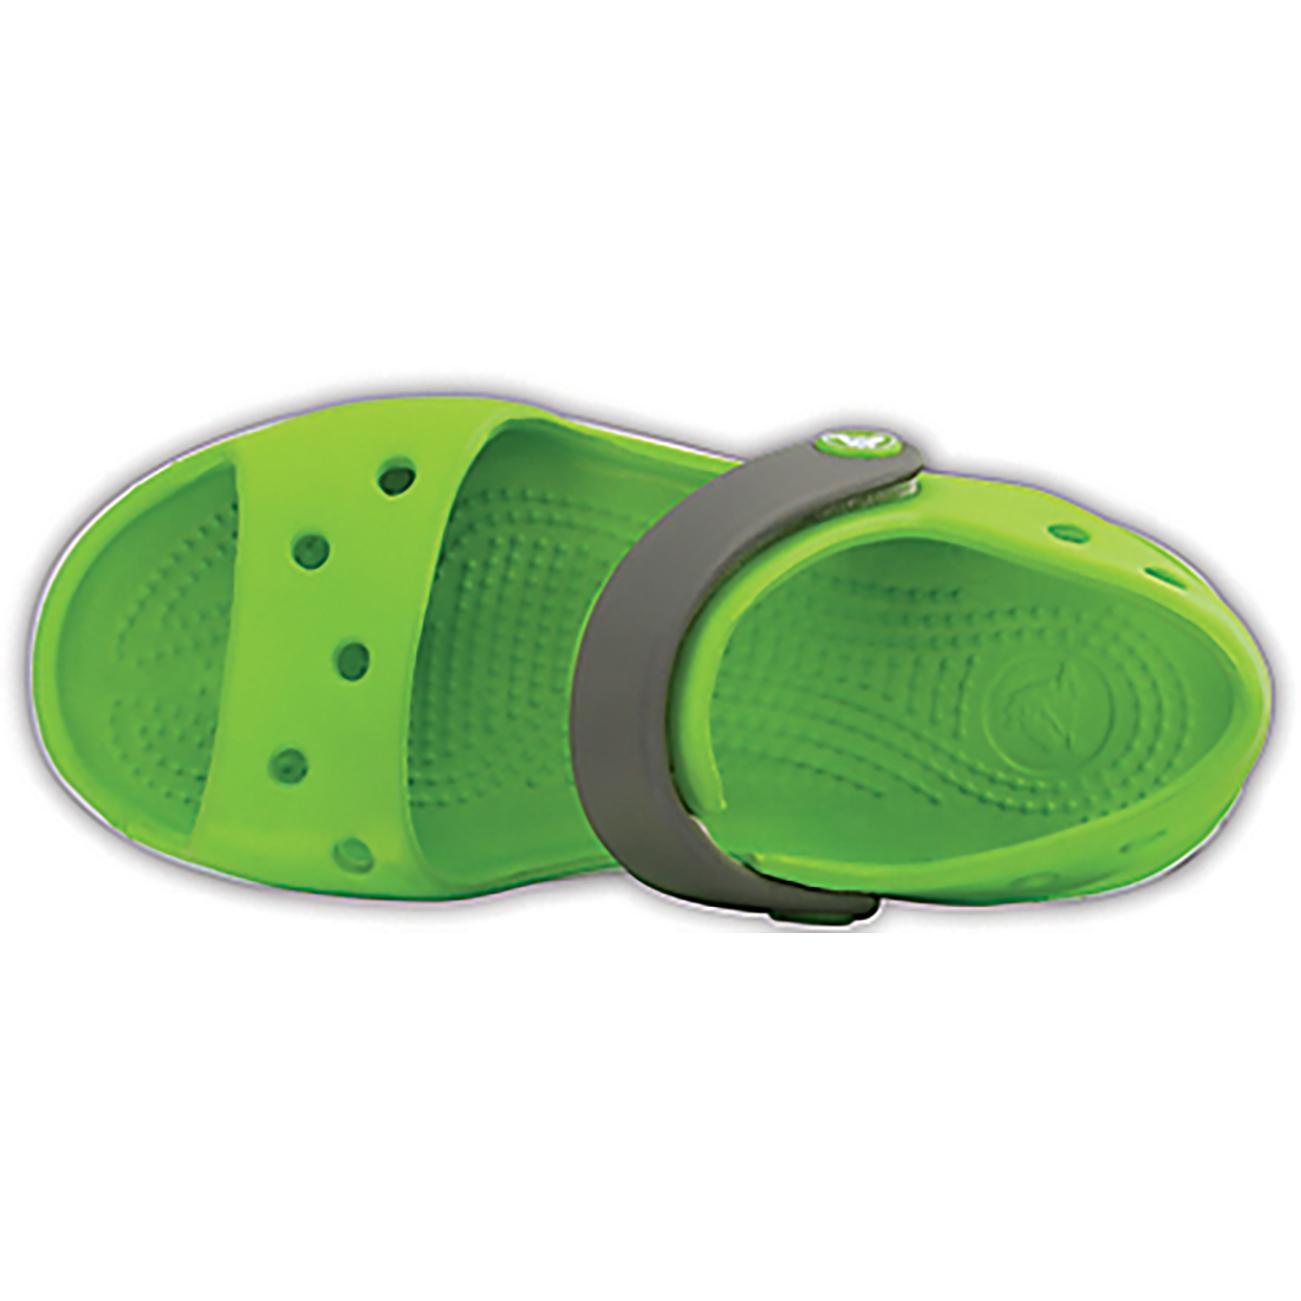 Unisex Kids Crocs Crocband Clog Water Resistant Sea Pool Rubber Sandal All Sizes